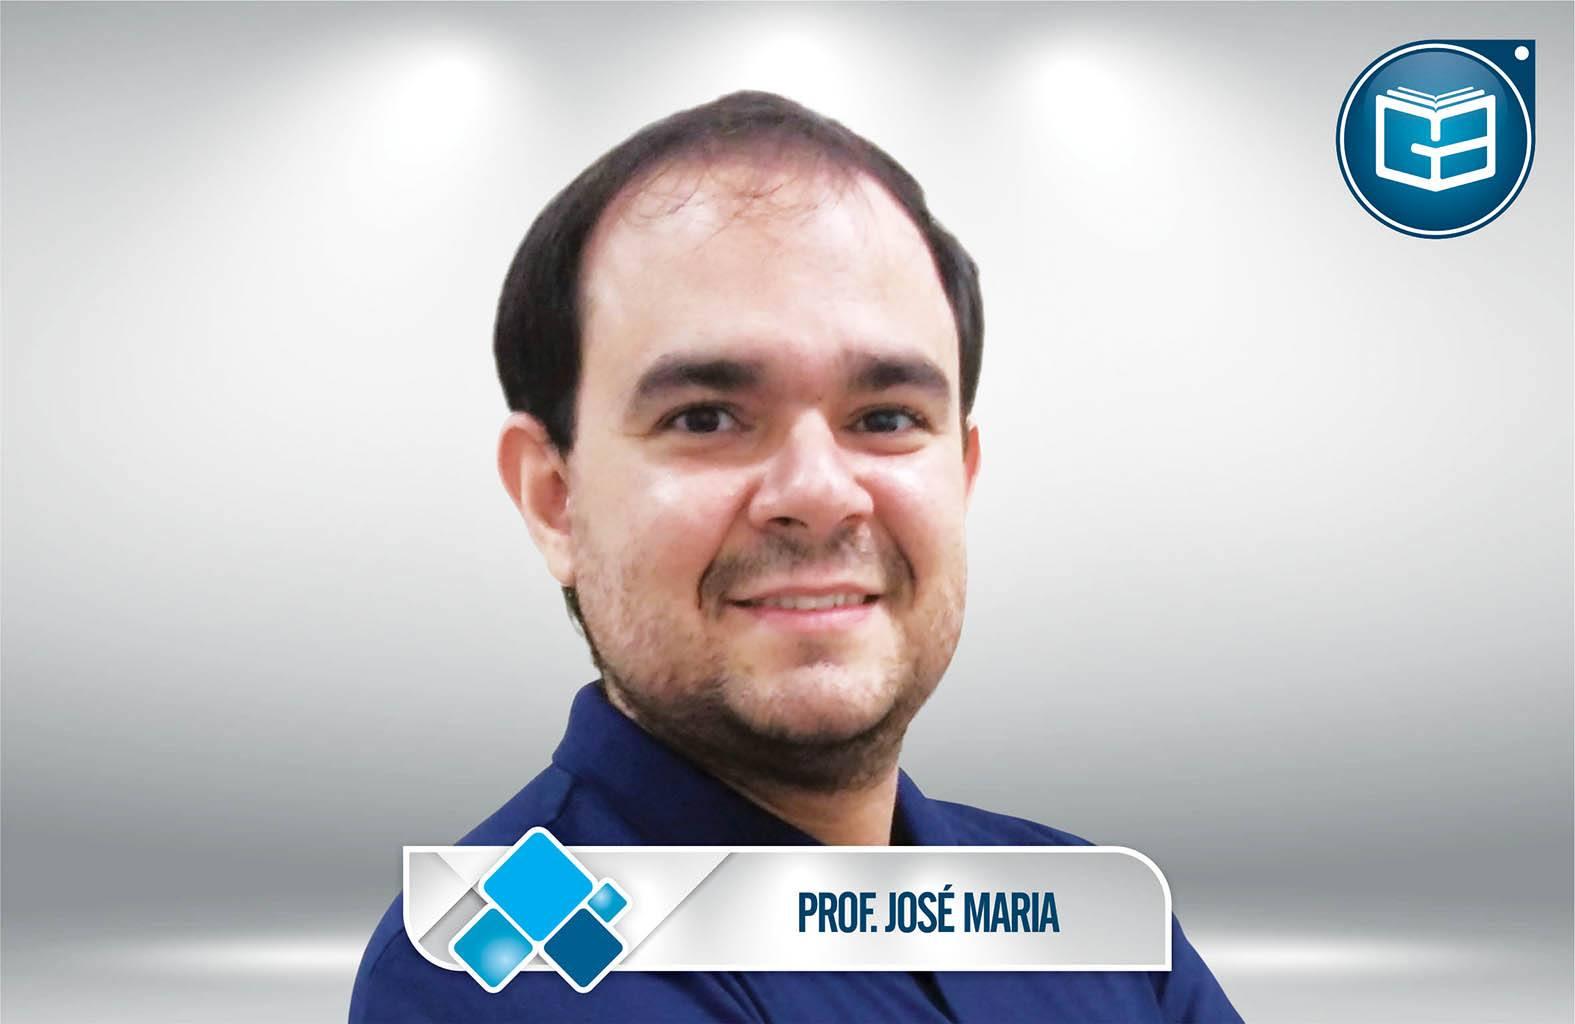 Apostila Assembleia Legislativa - Professor José Maria